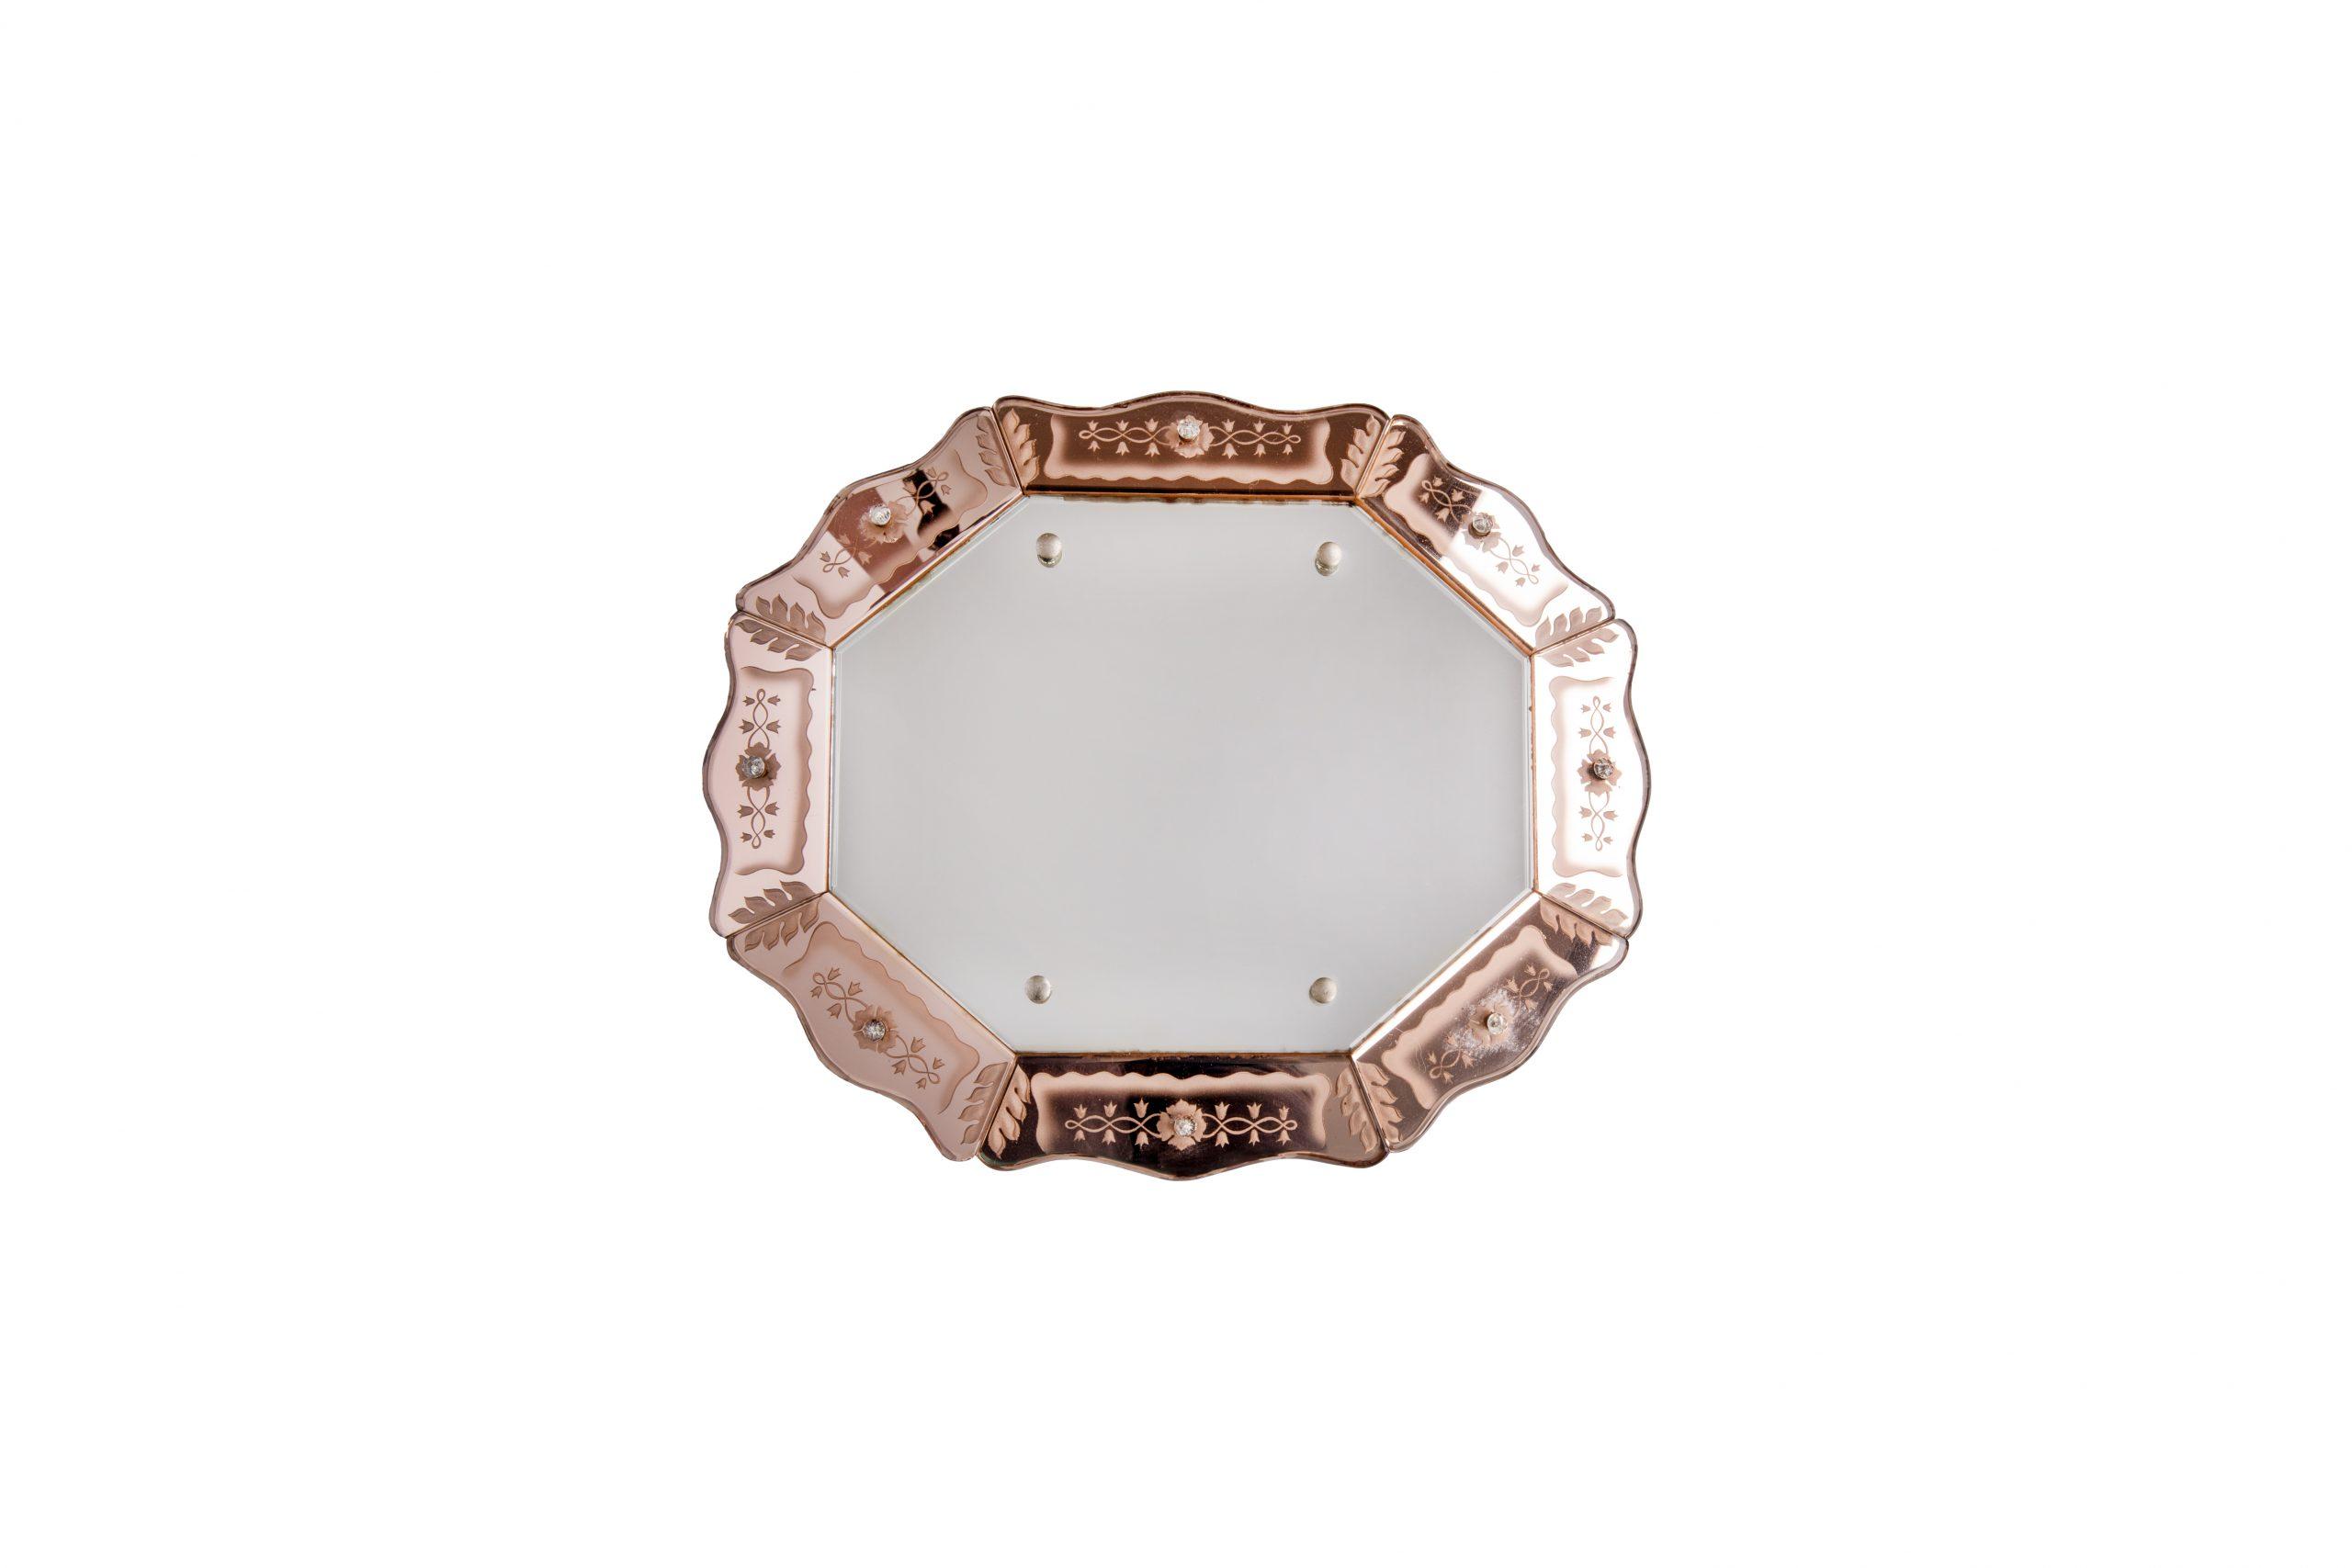 Venetian art-deco wall mirror